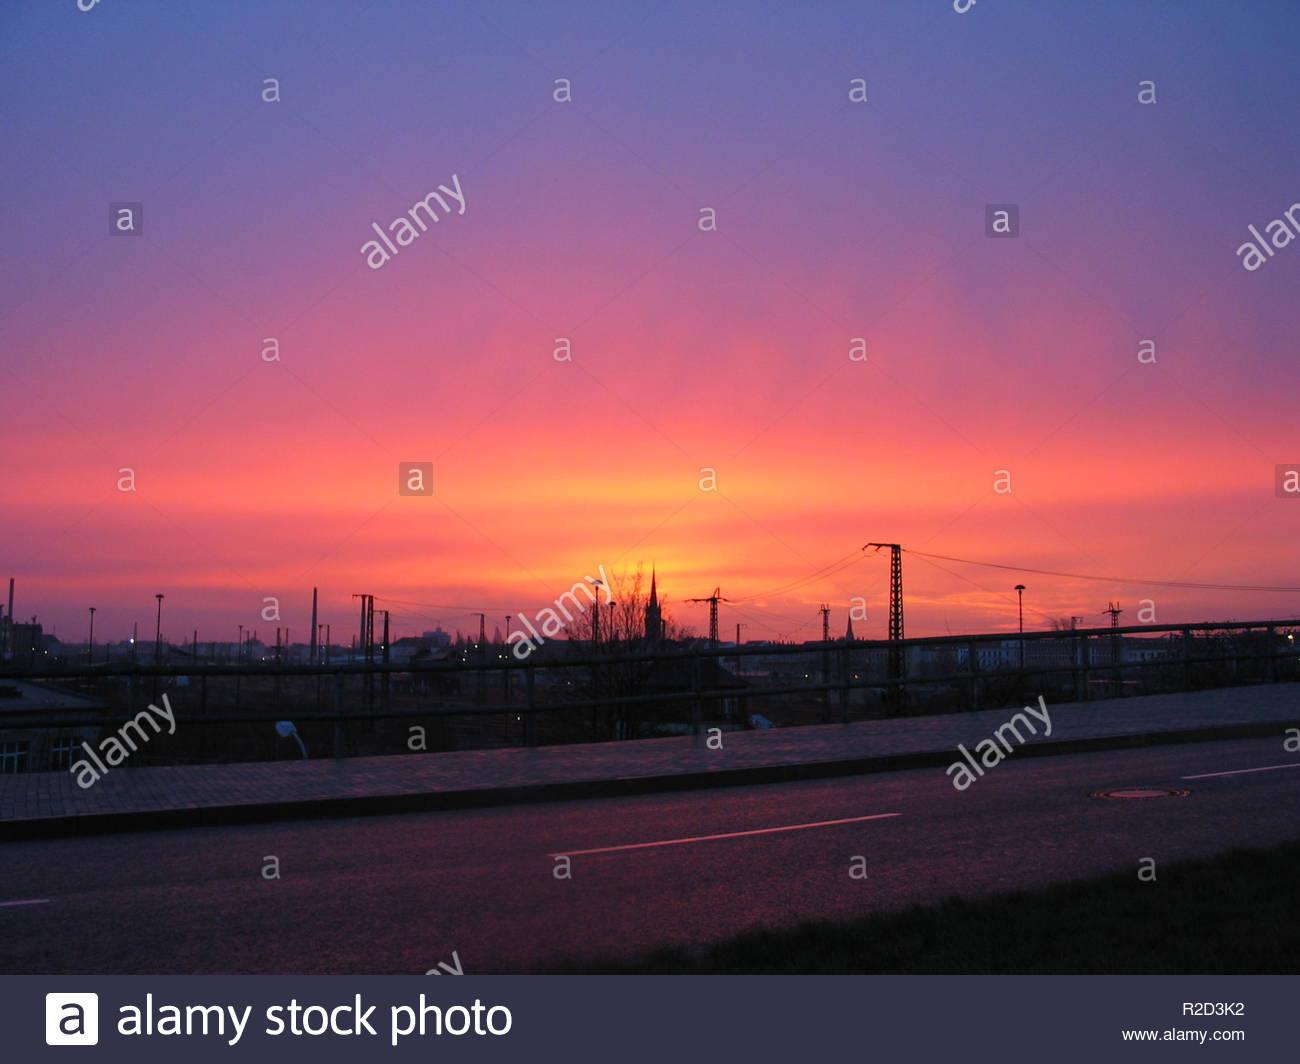 sky spectrum - Stock Image